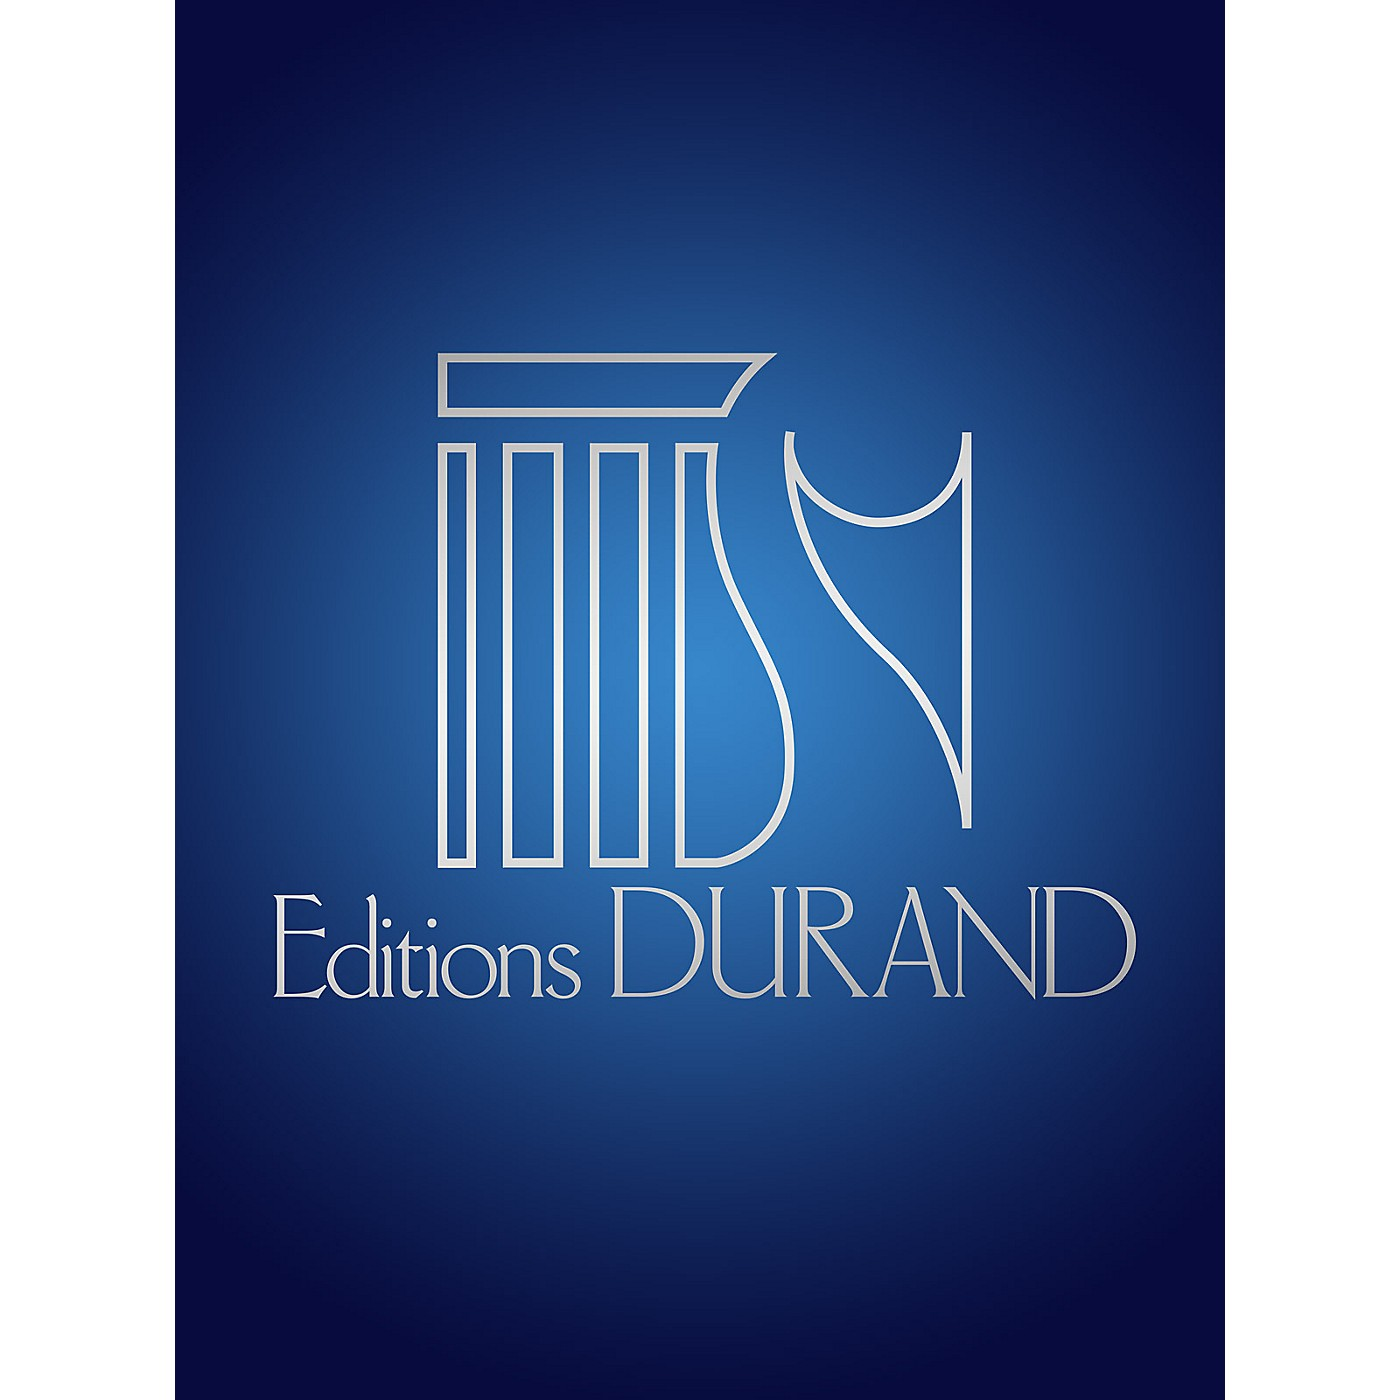 Hal Leonard Mazurkas Volume 2 Piano Editions Durand Series thumbnail